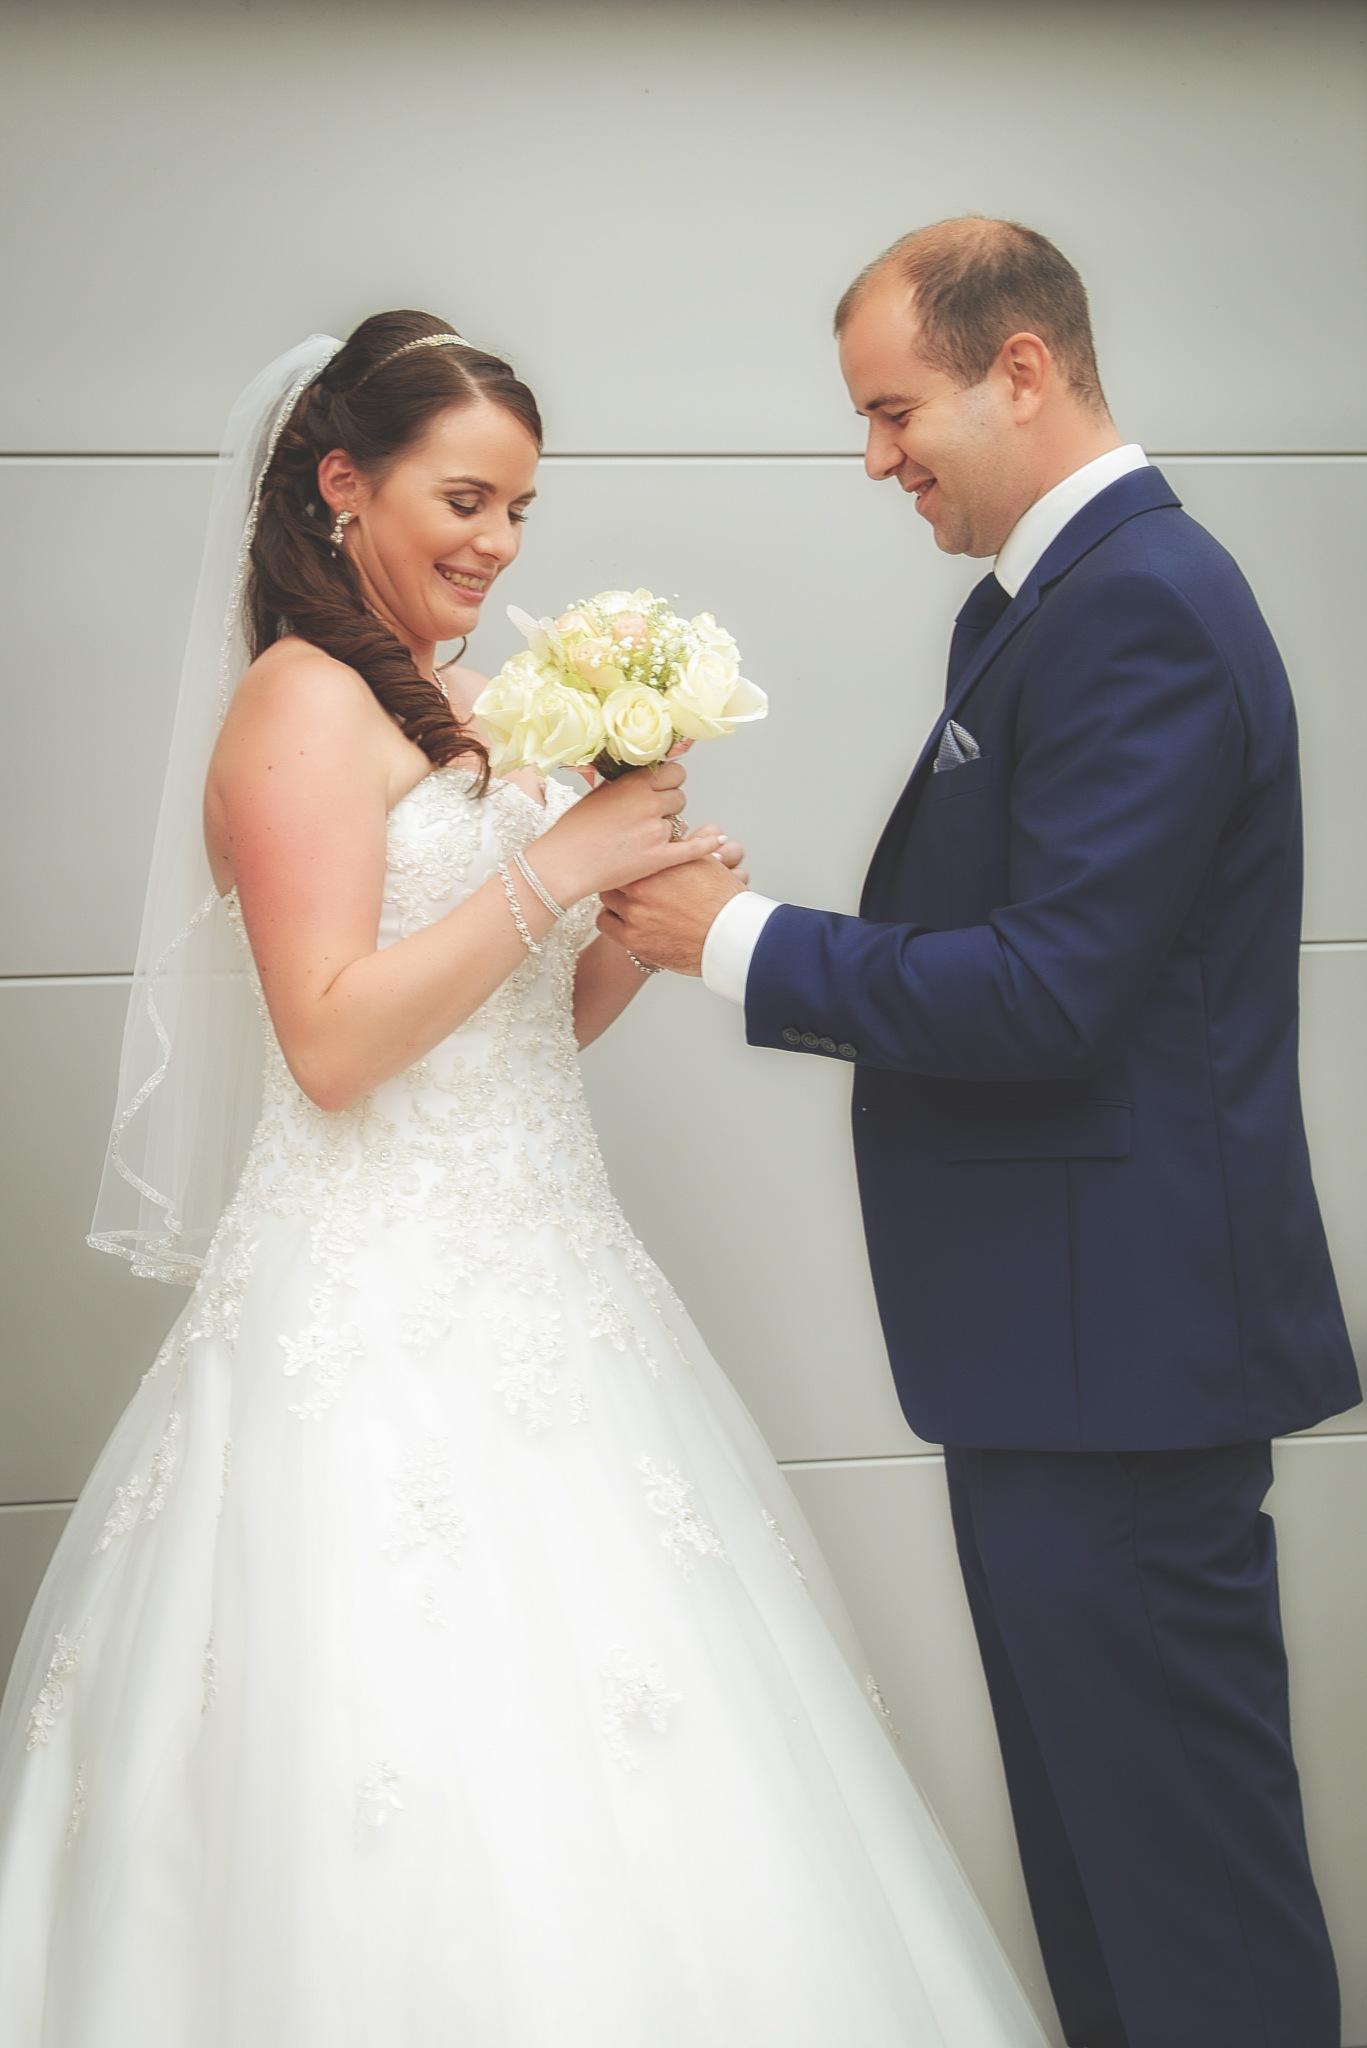 She said yes! by Ellen Thys